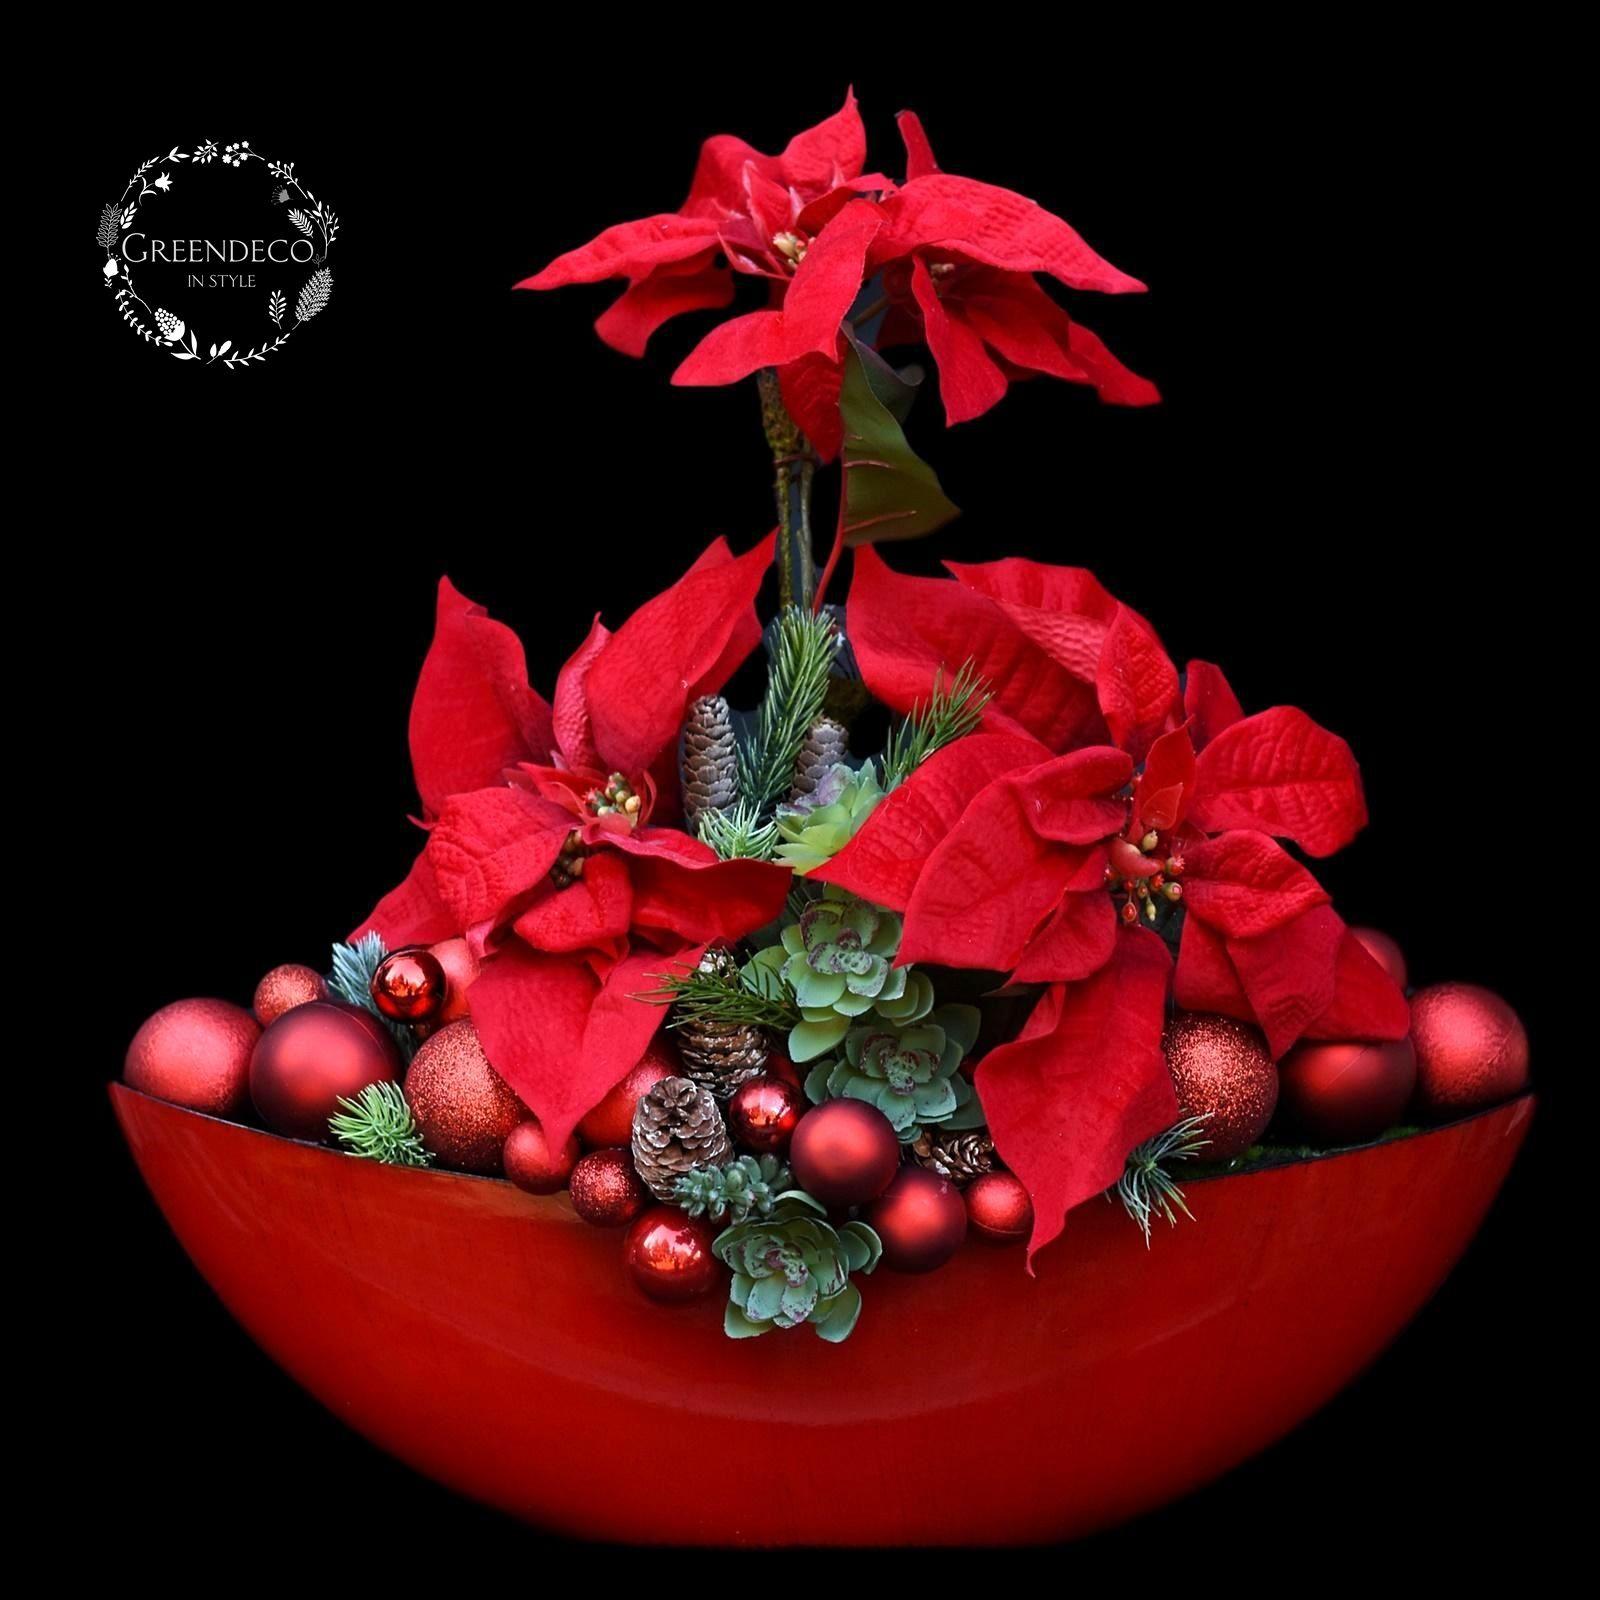 Gwiazda Betlejemska Poinsettia Christmas Decorations Christmas Time Christmas